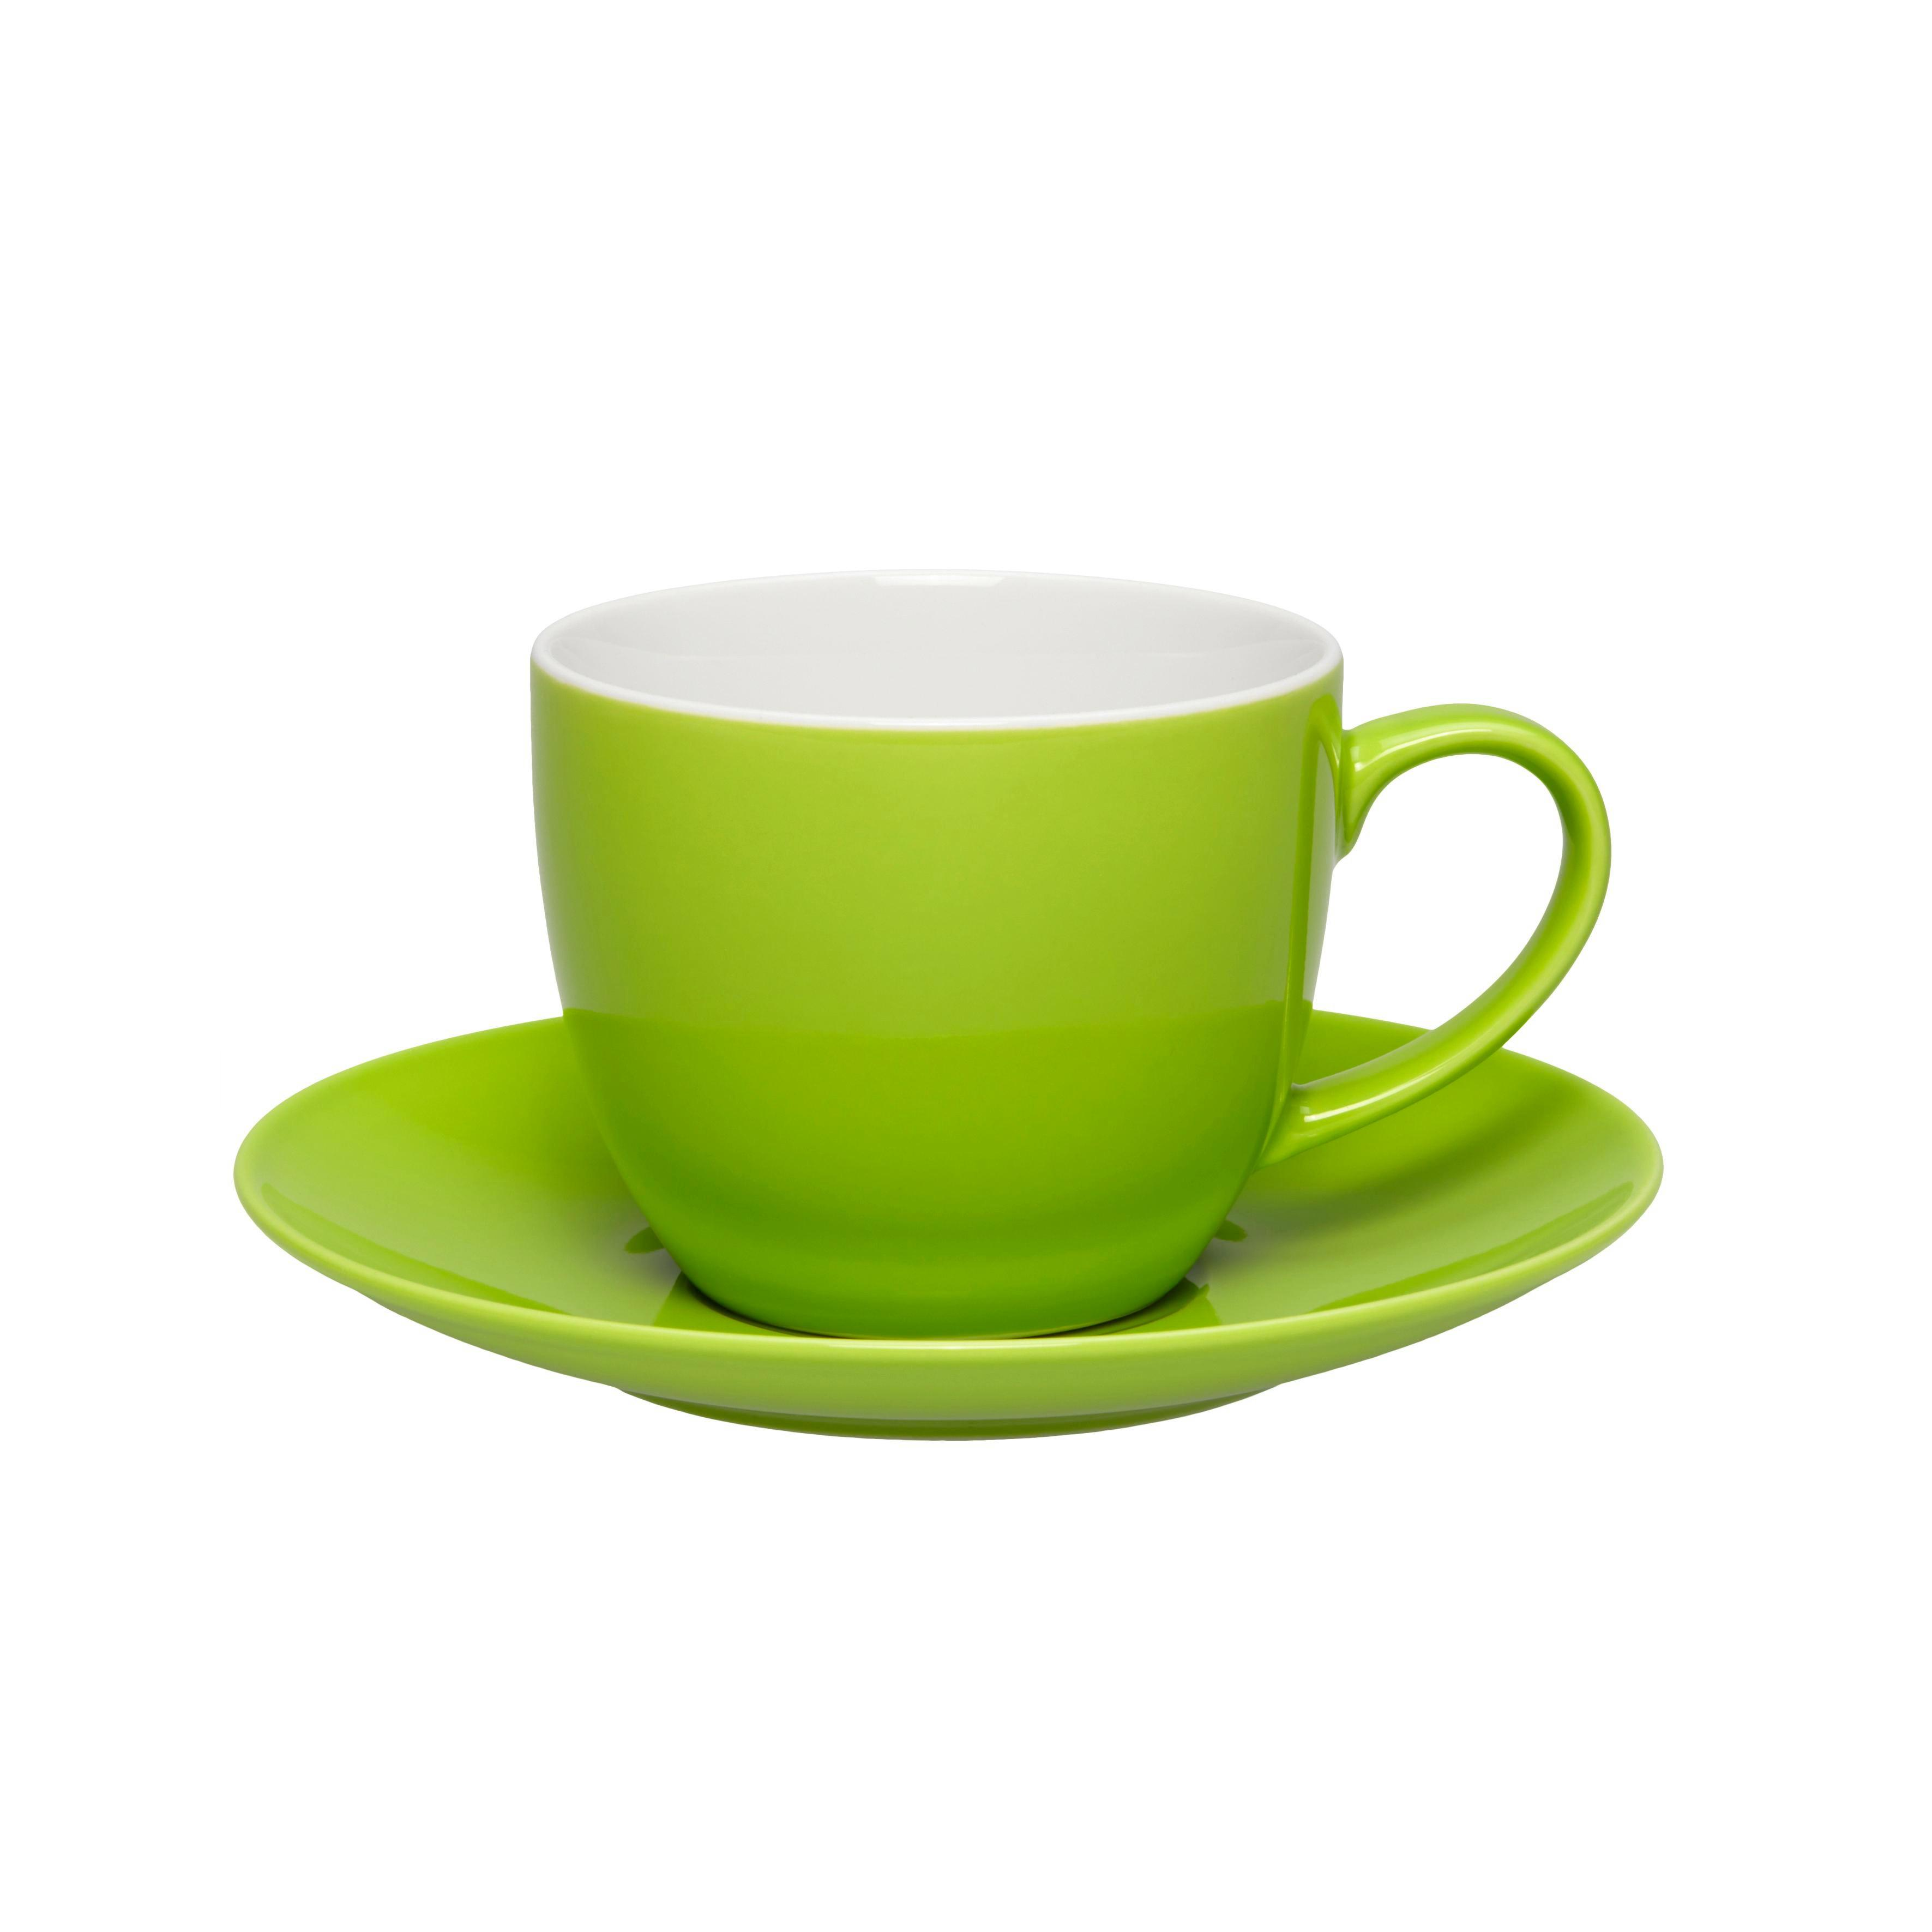 Kaffeetasse mit Untertasse Sandy in Grün aus Keramik - Grün, KONVENTIONELL, Keramik (5/6,9cm) - MÖMAX modern living